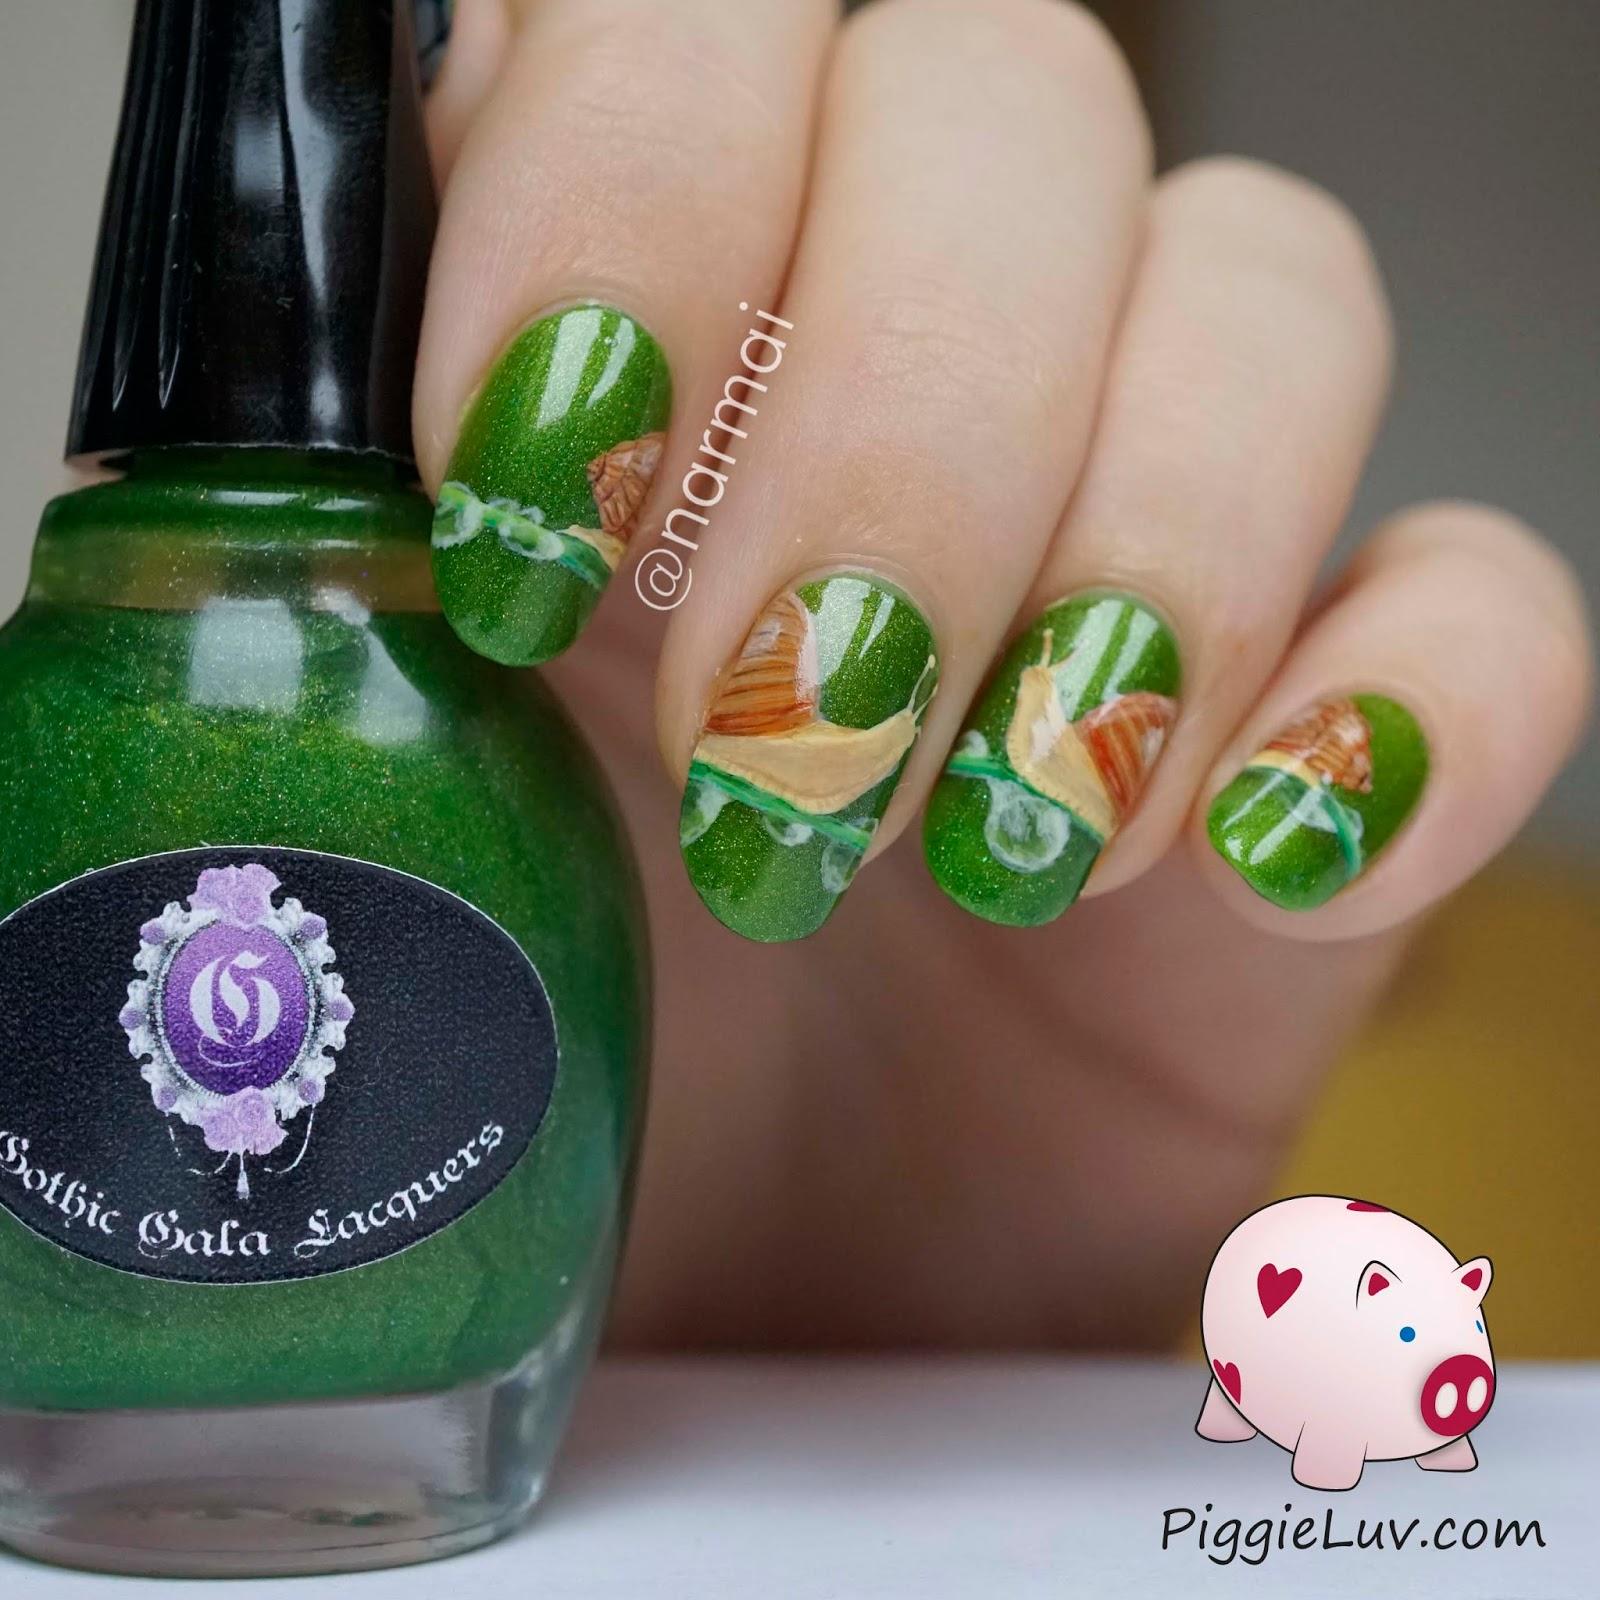 Love Nail Art: PiggieLuv: Snails In Love Nail Art